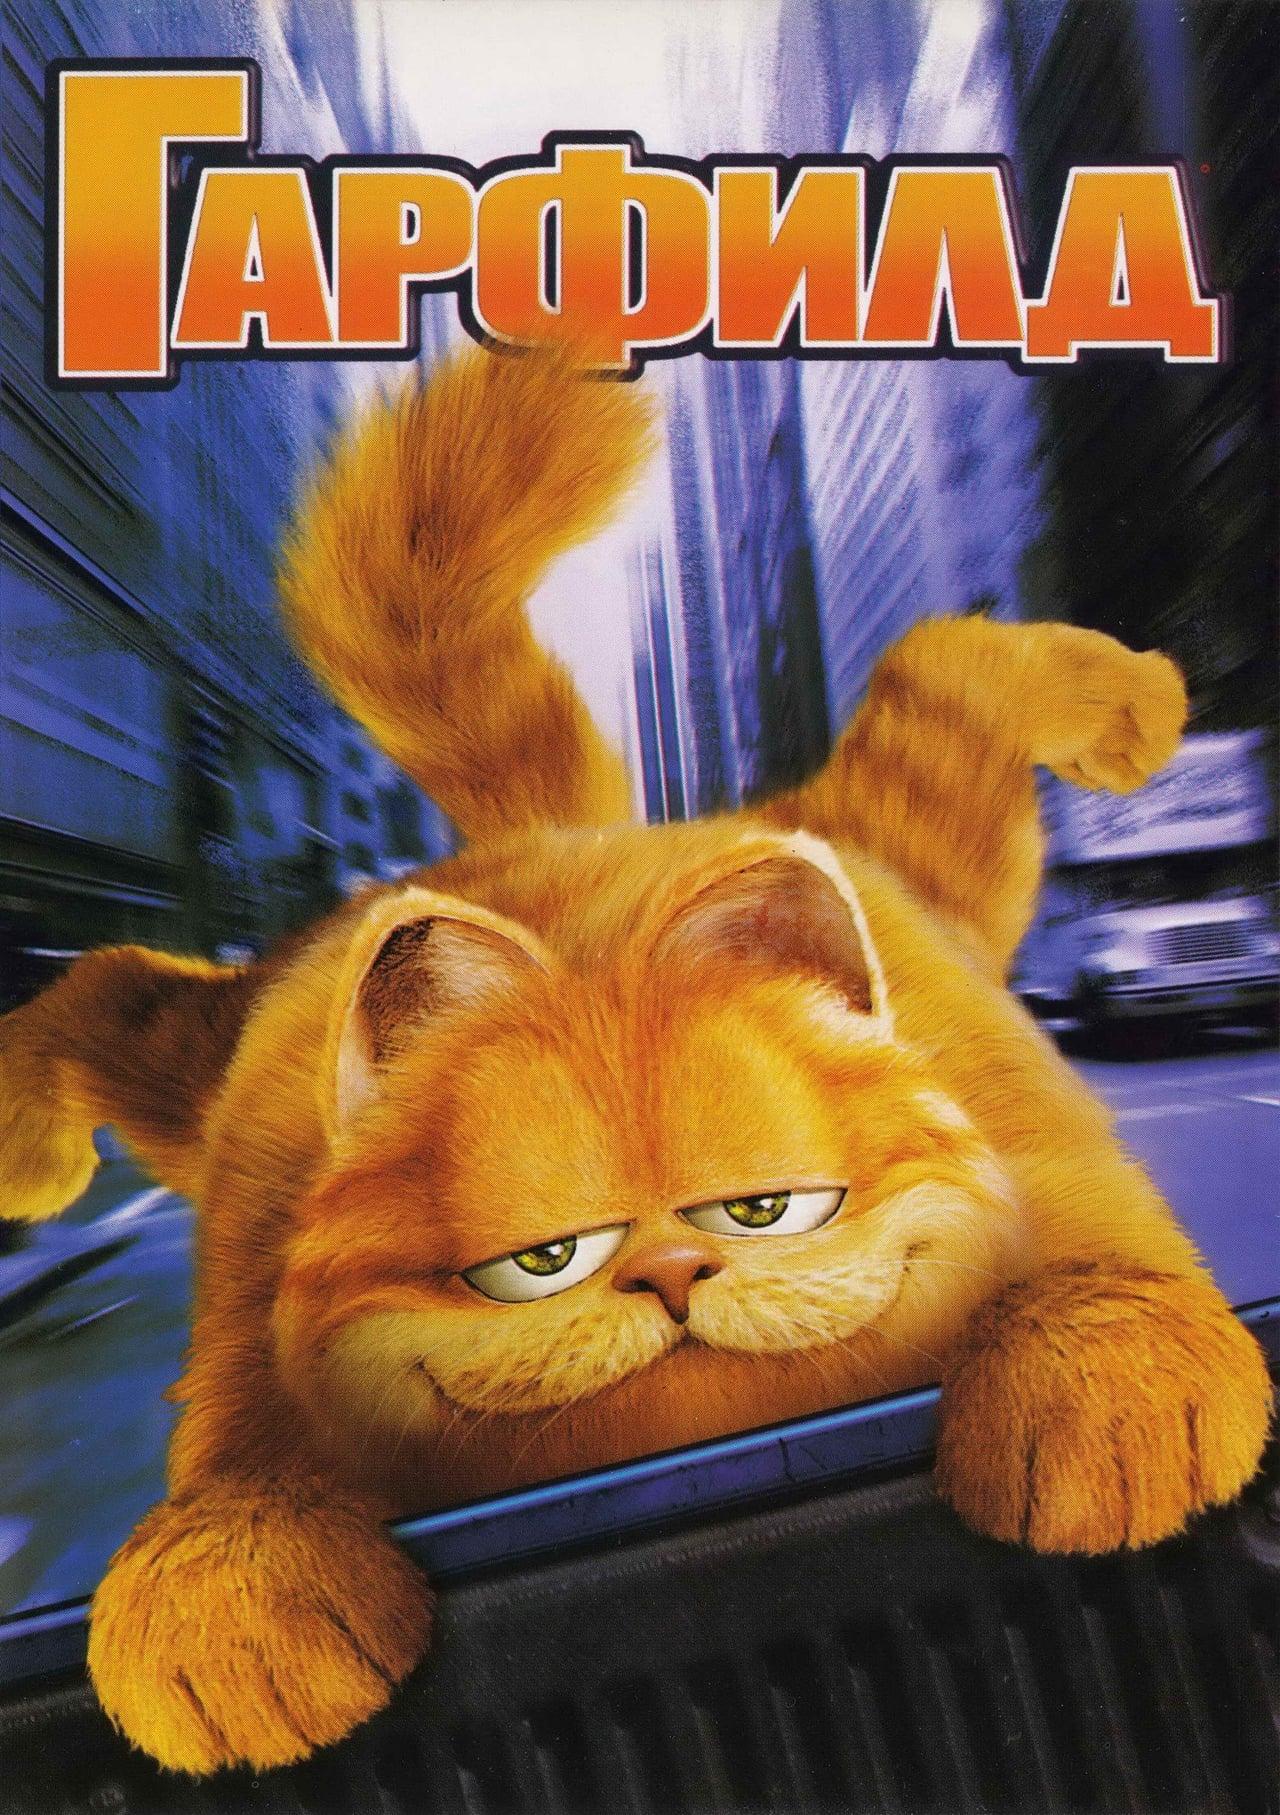 Garfield 2004 Tamil Dubbed Movie Download Moviesda